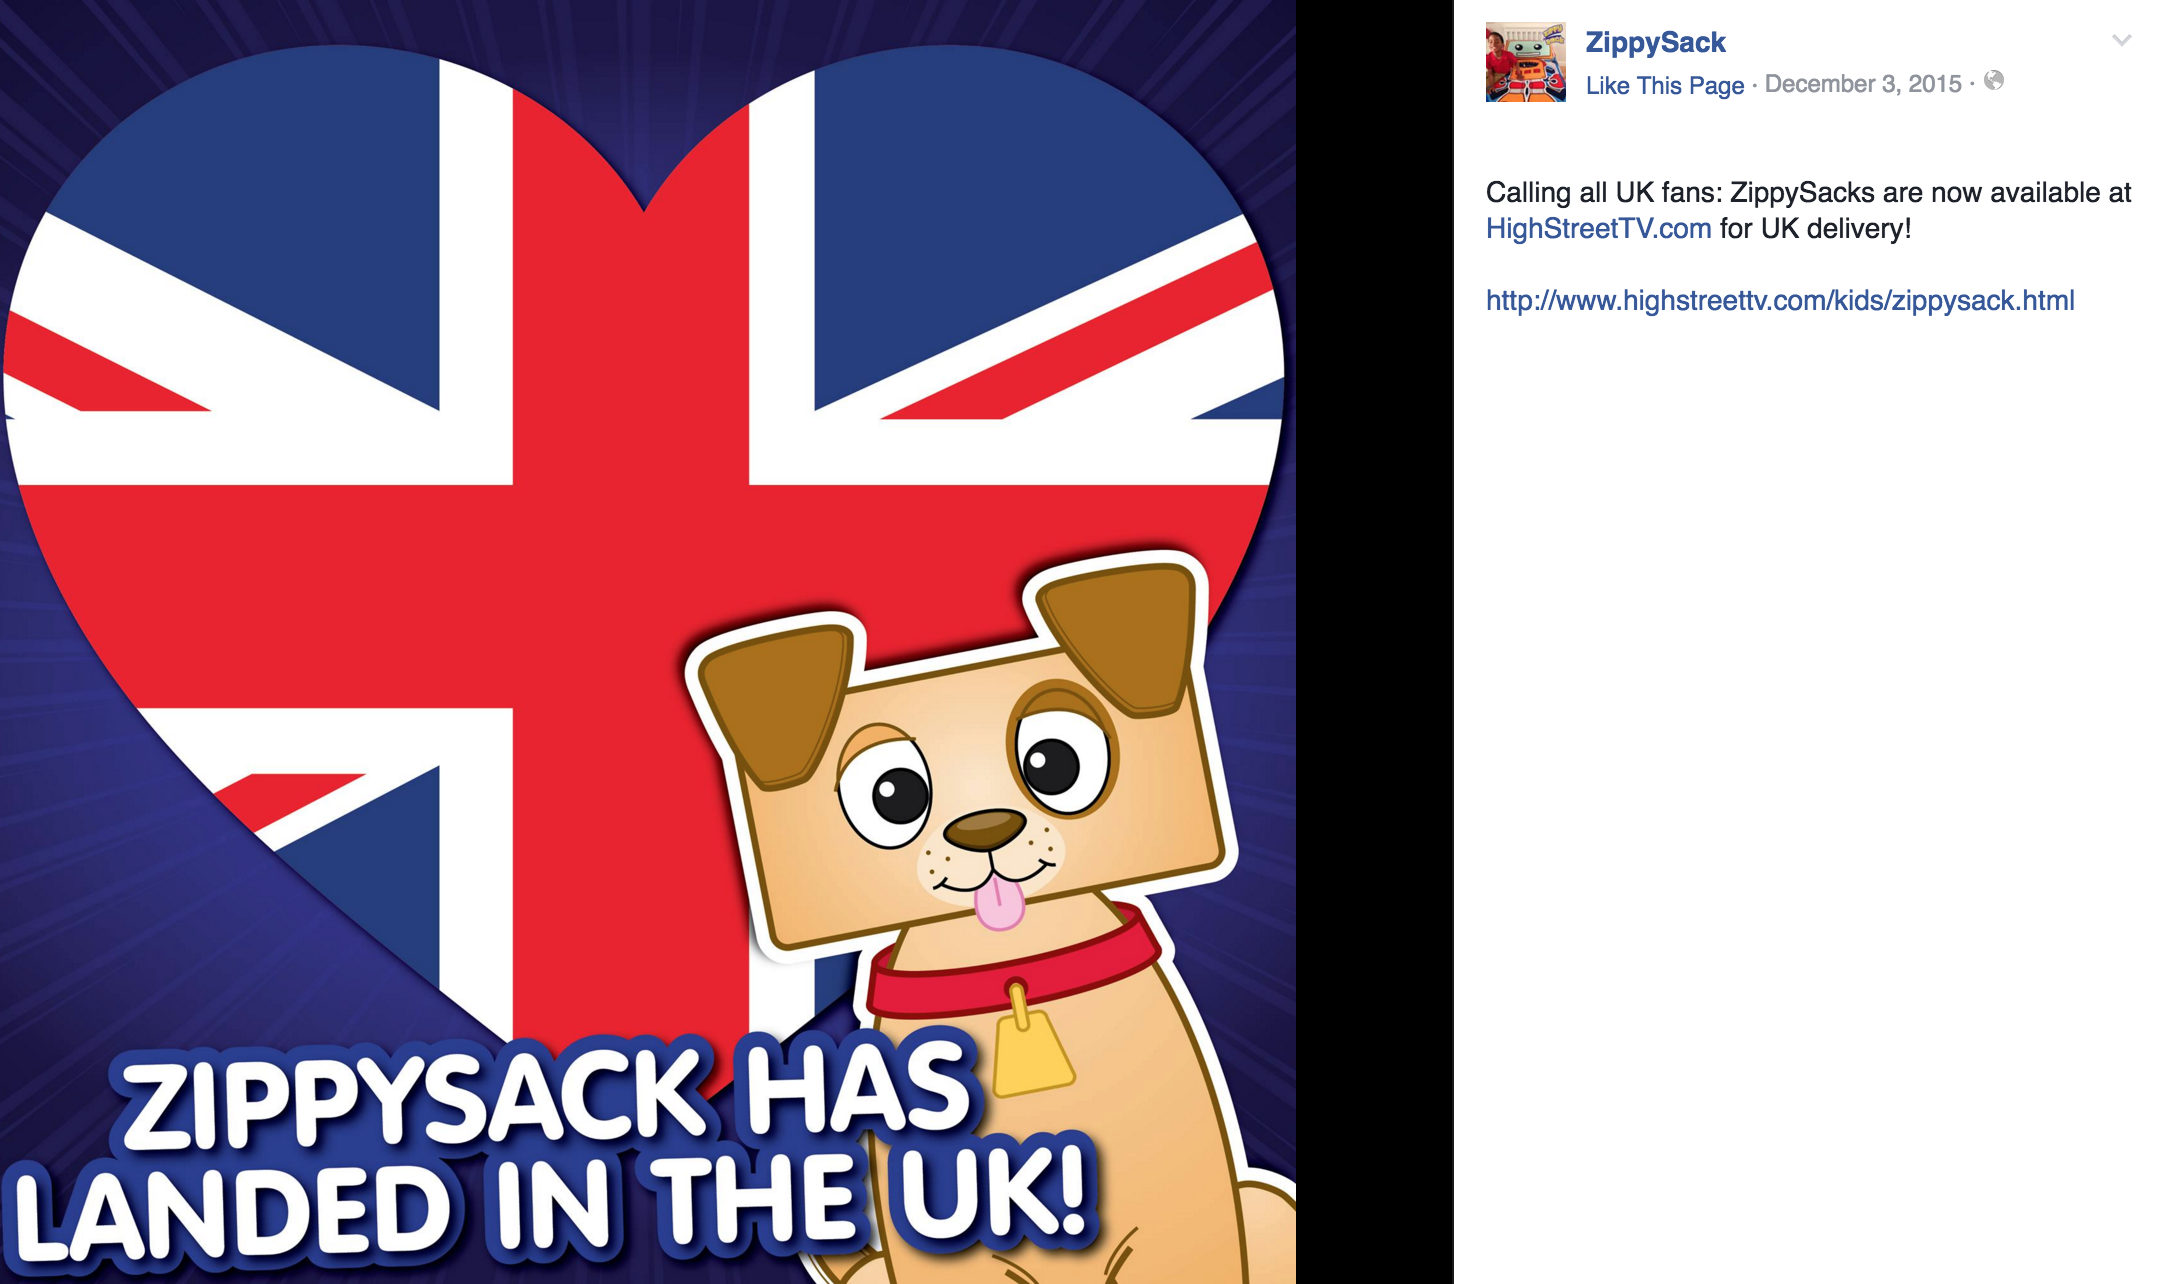 Facebook: Calling UK Fans